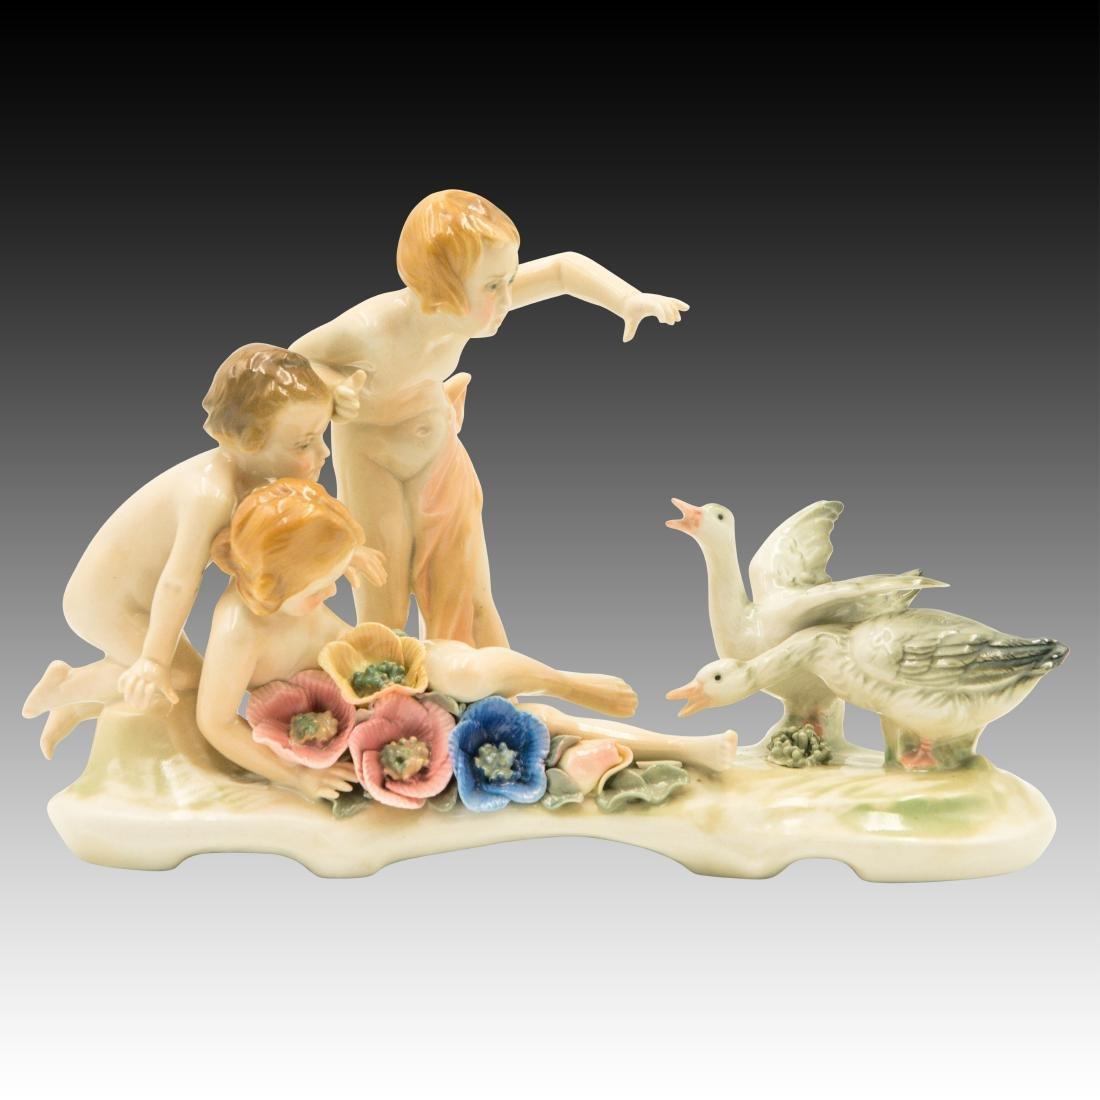 Karl Ens Figurine Children versus the Ducks